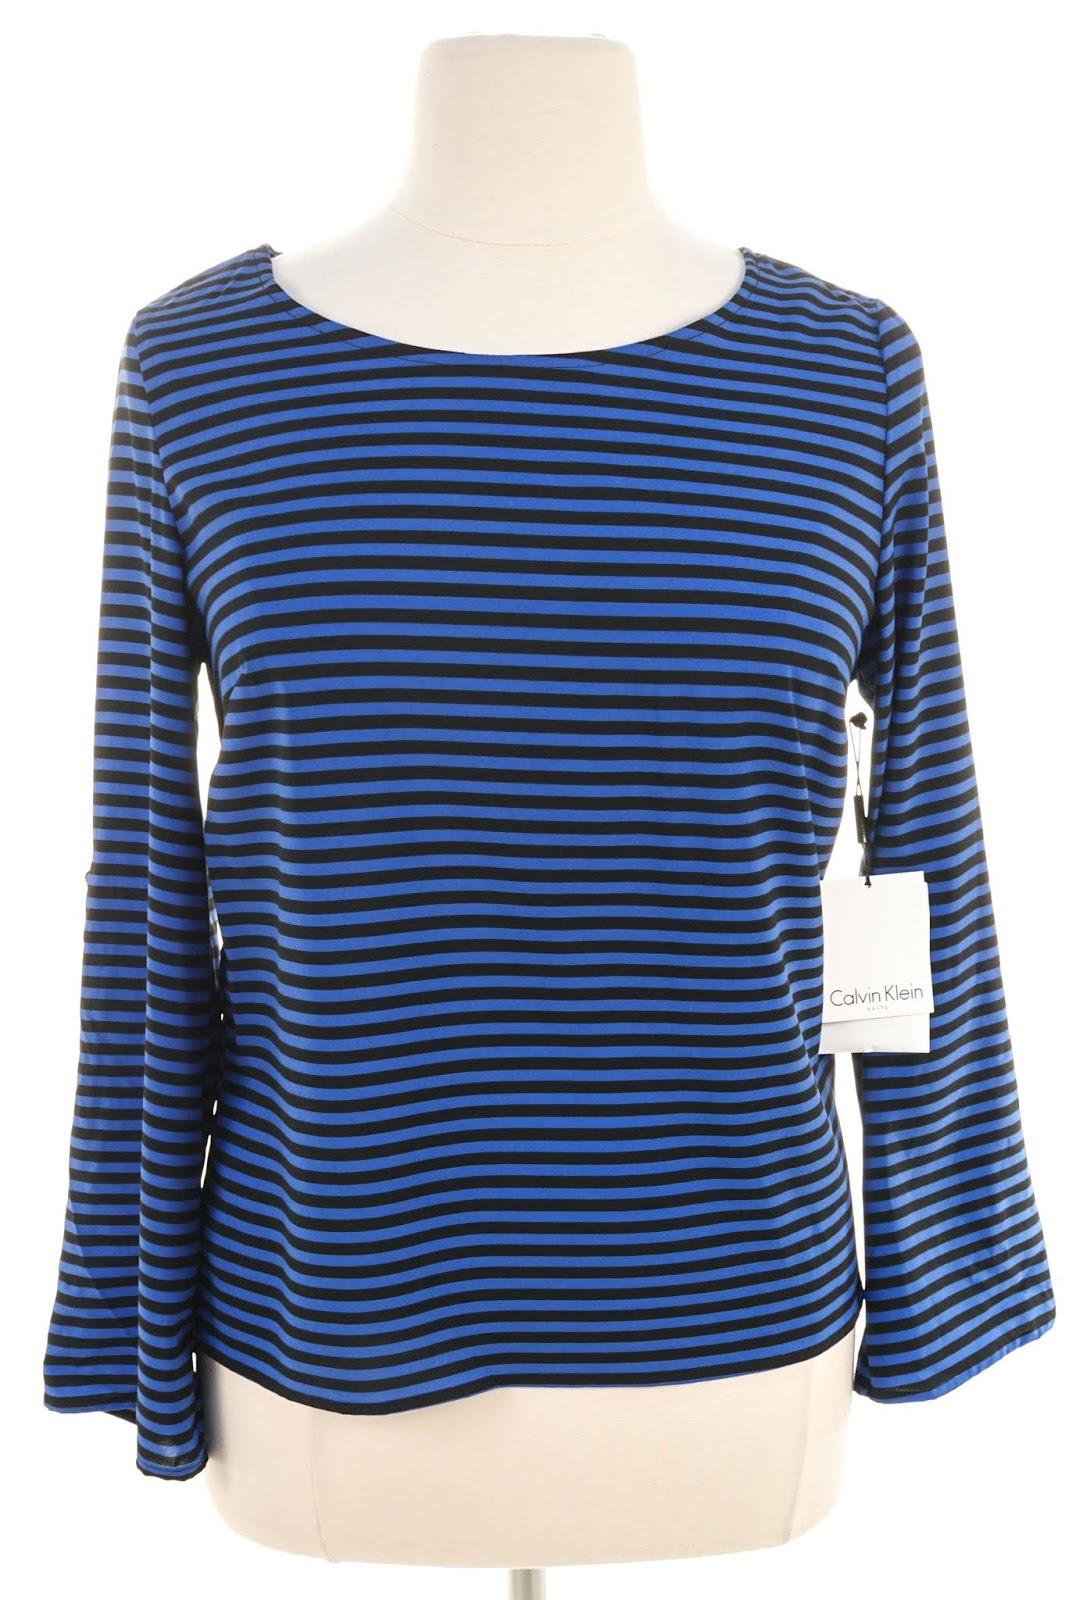 fc01848db1 women's long sleeve striped shirt with light and dark blue thin stripes · Calvin  Klein ...